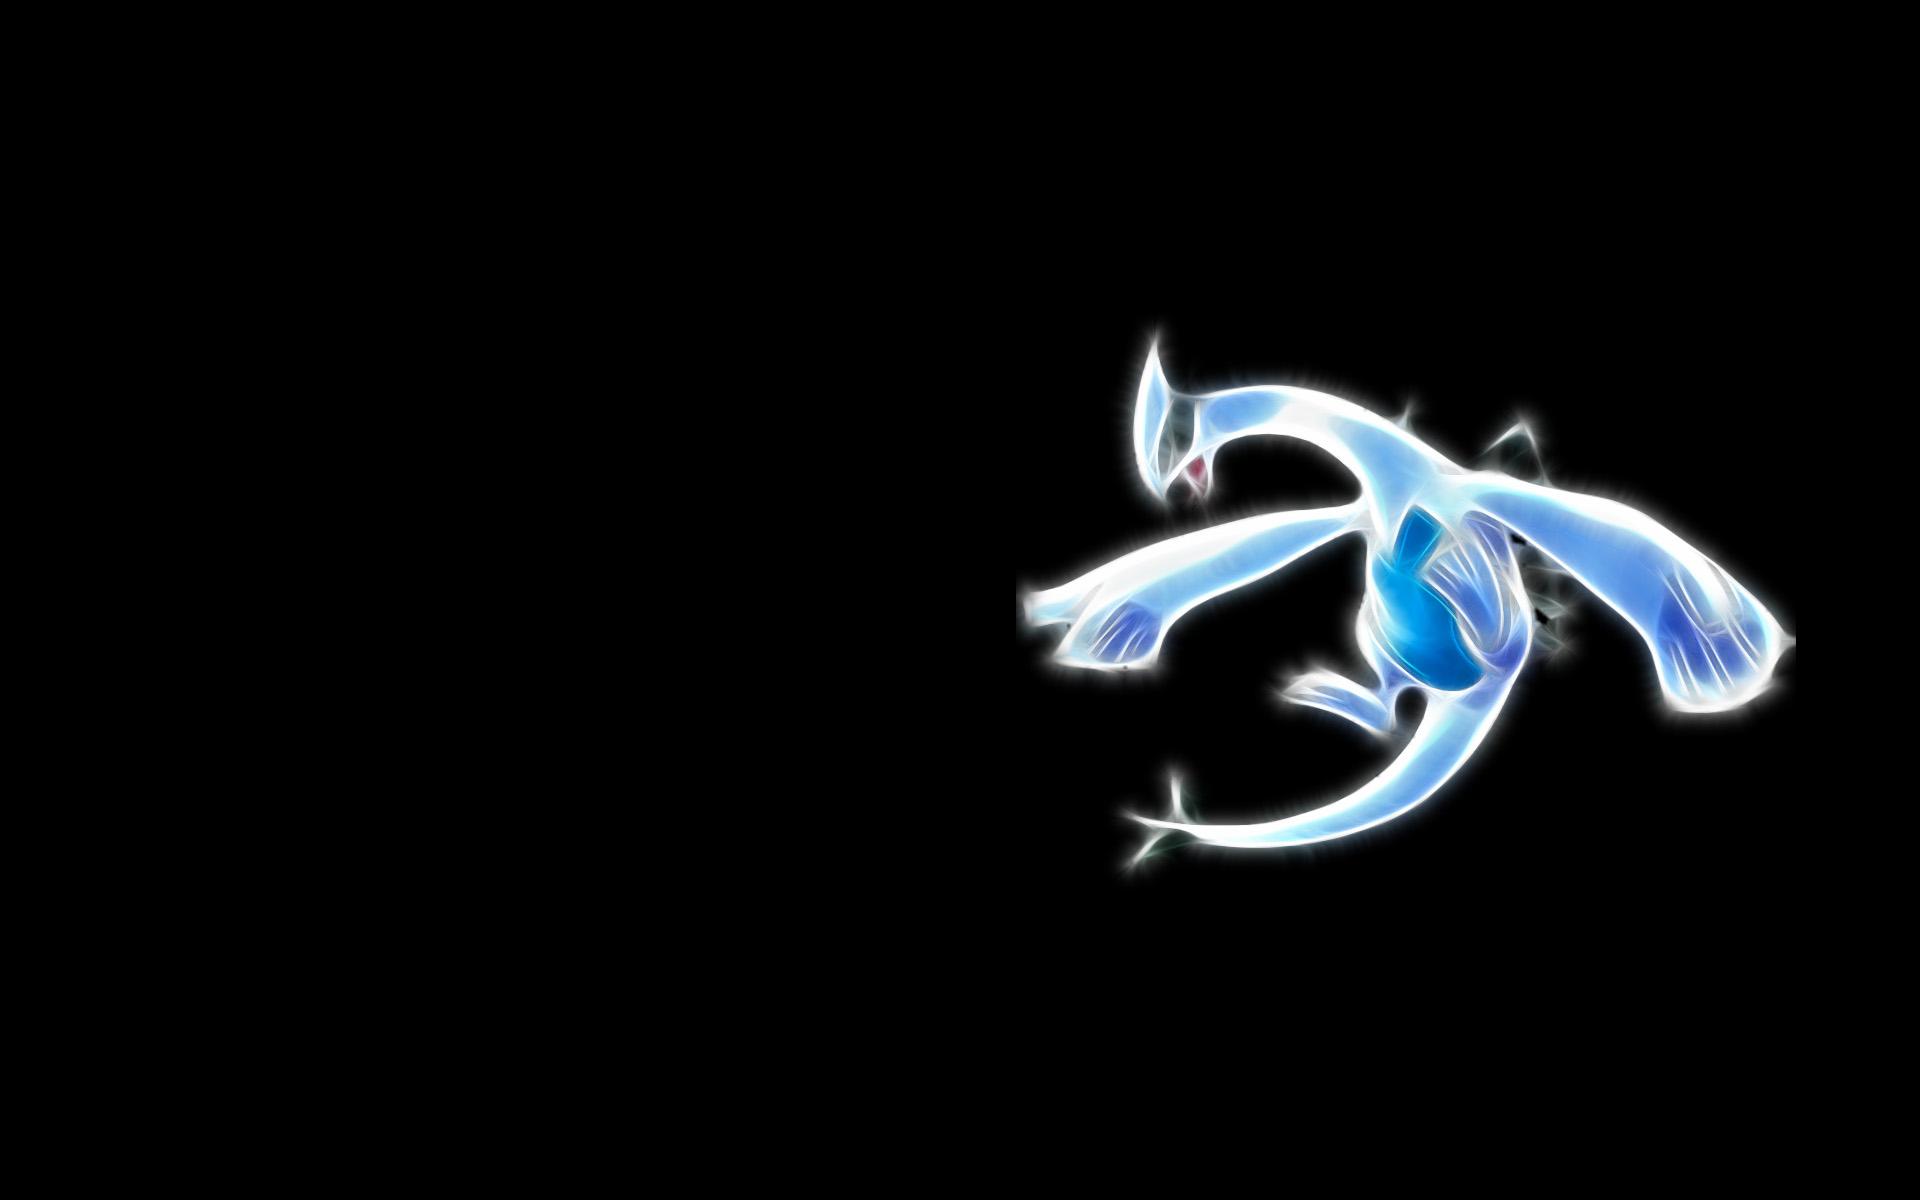 Pokemon Lugia Black Entertainment HD Wallpaper 1920x1200